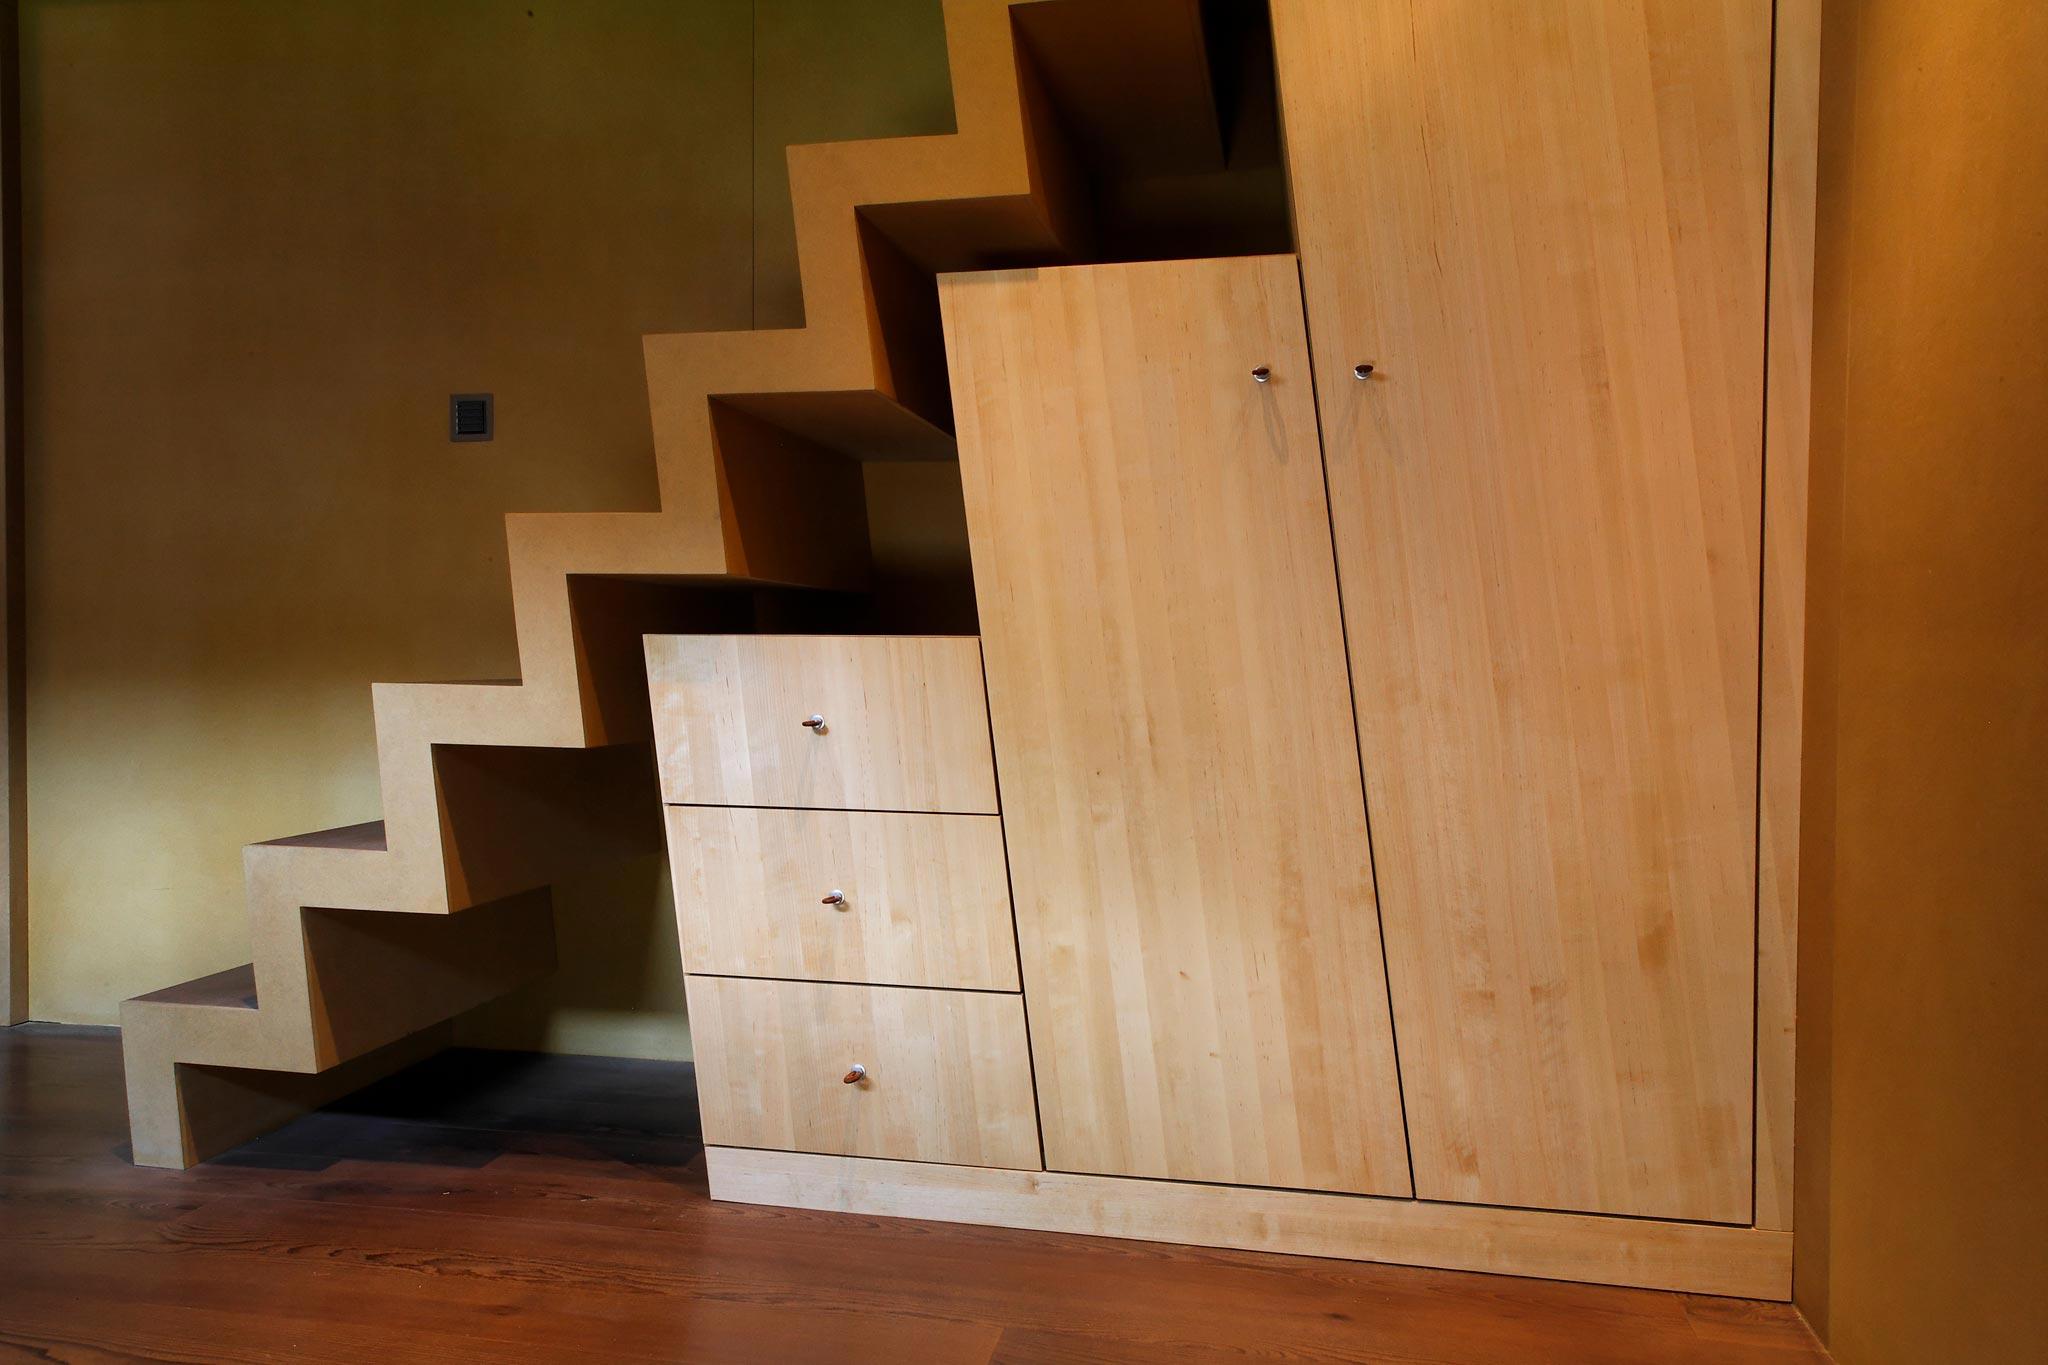 Es Gd Raccard 678 escalierEtage hor 20 05 009 - Le 2ème escalier du Grand Raccard